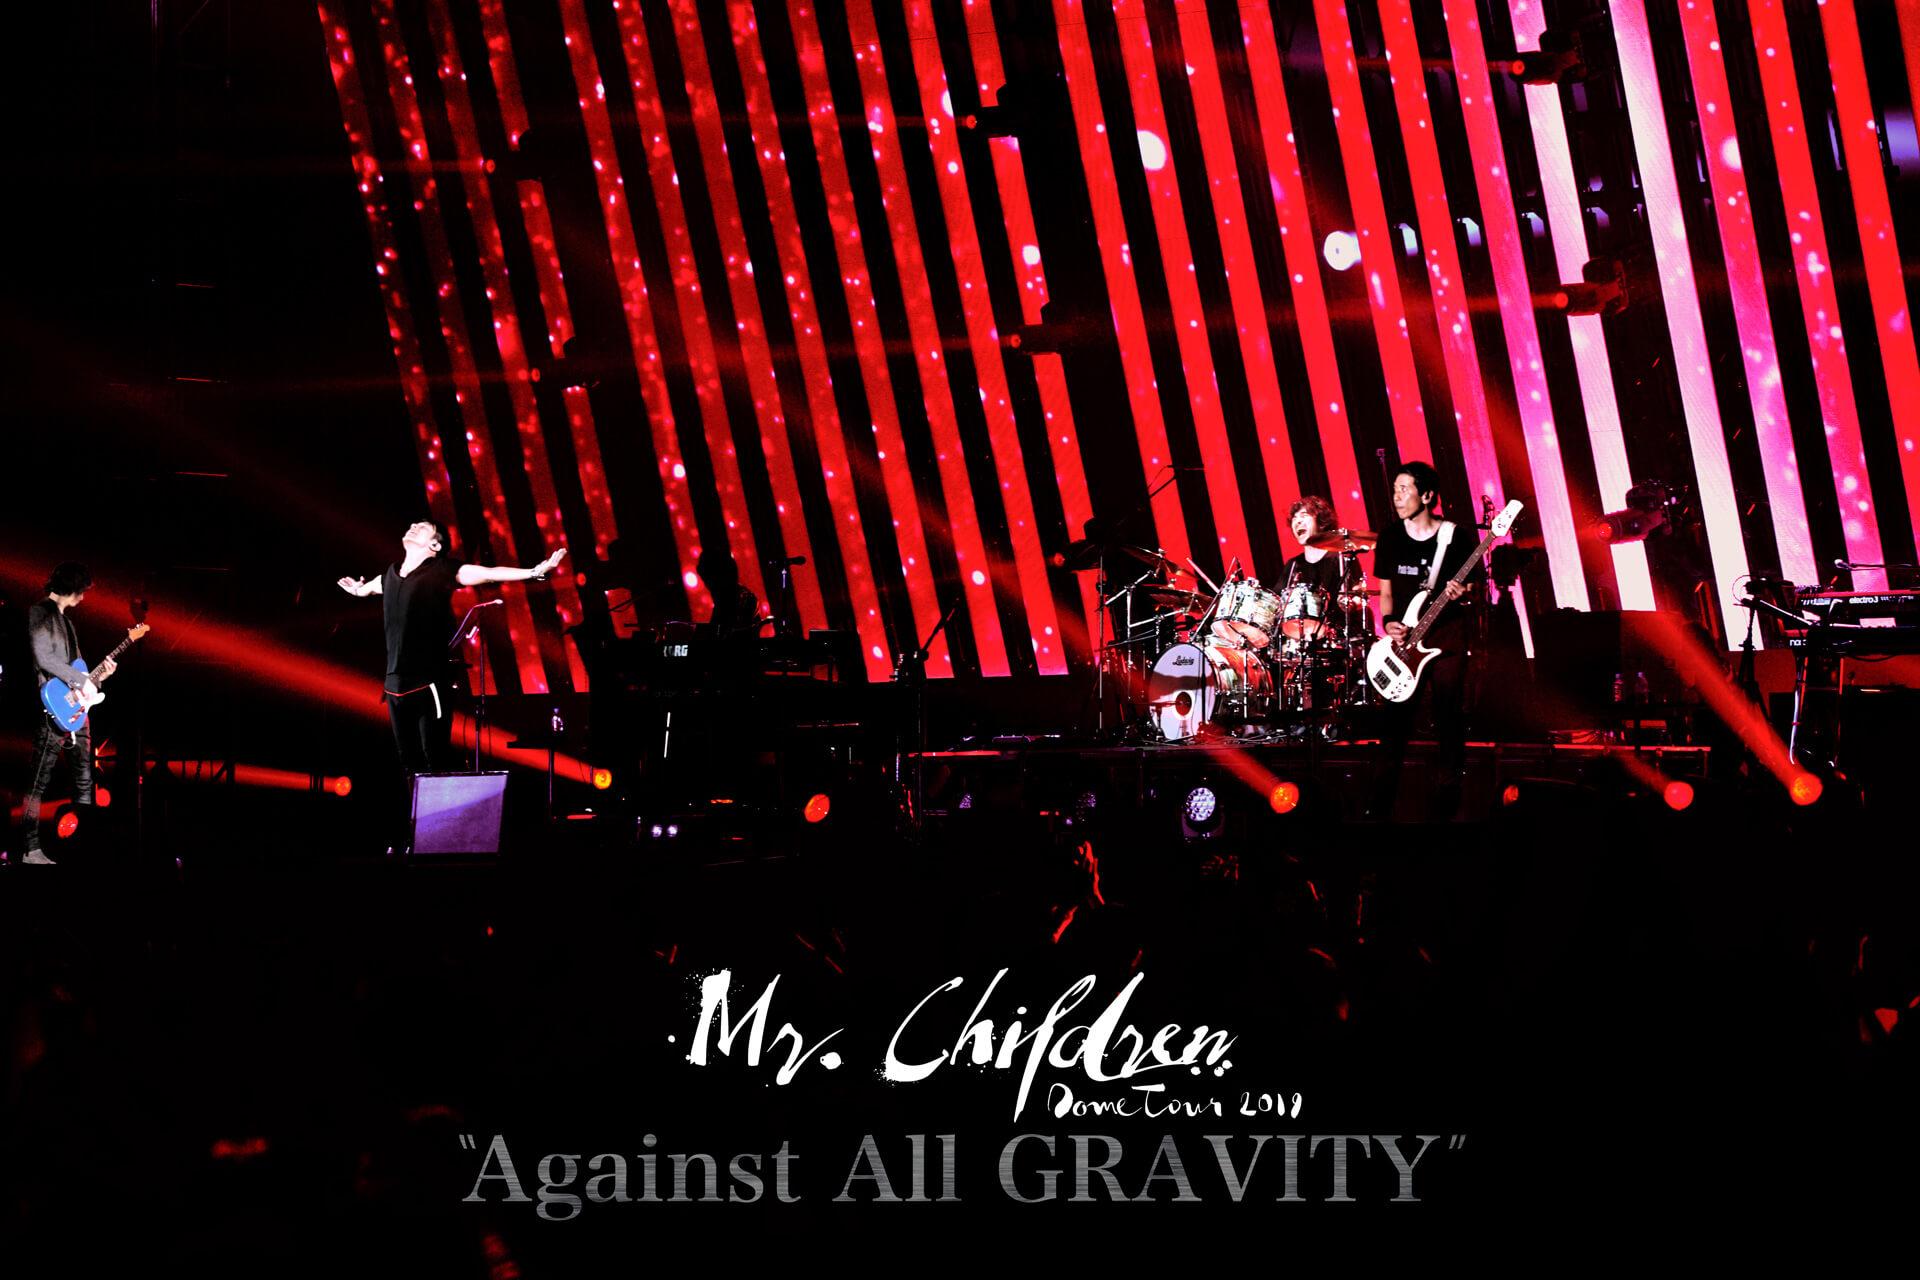 【2019 4/20 Mr.Children】 福岡ヤフオクドームライブのセトリ・感想・MC・名言【Against All GRAVITY】